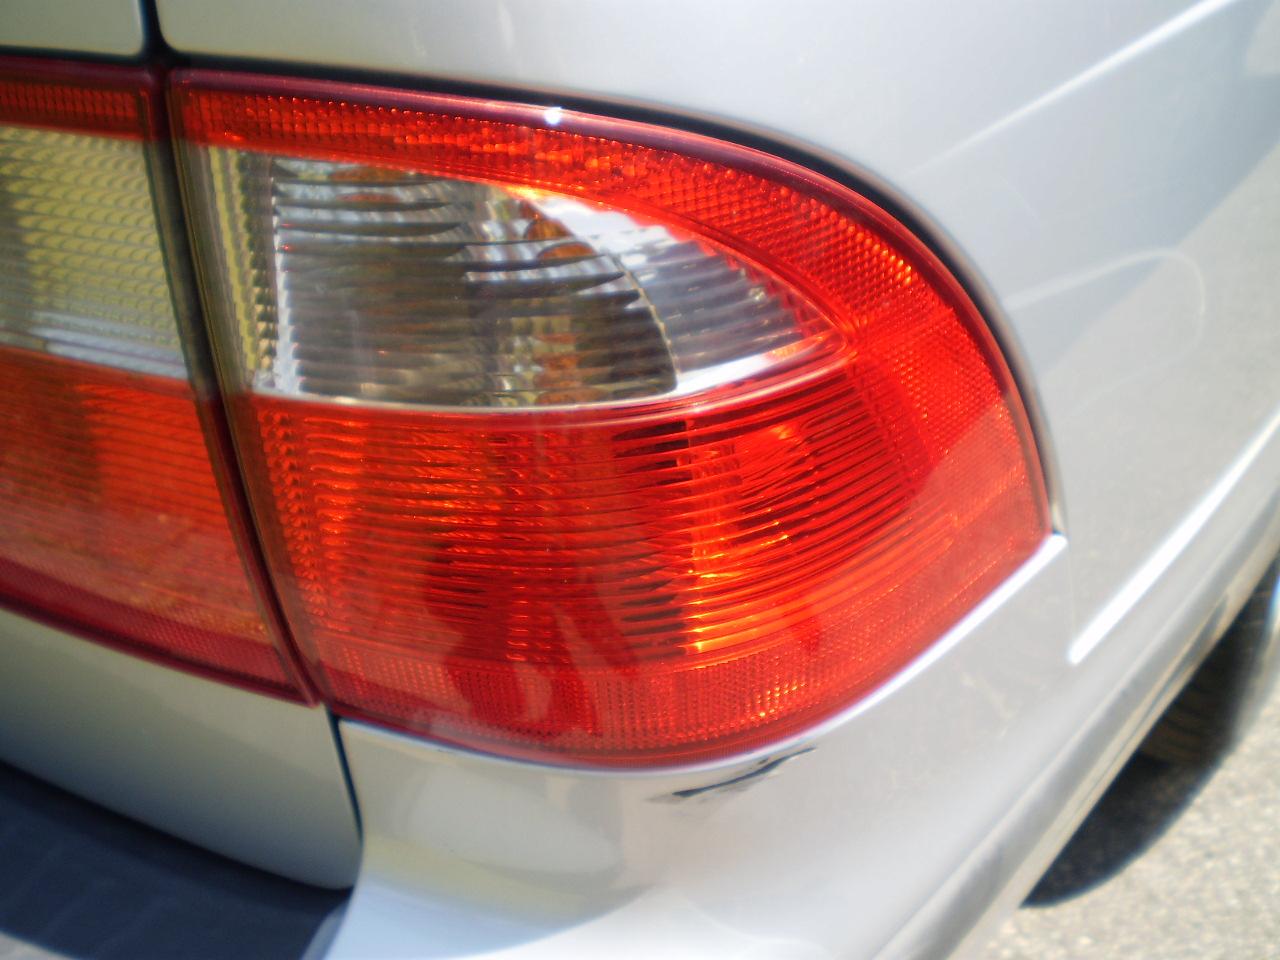 Passenger Side Tail Light 2003 SAAB 9-5 Wagon